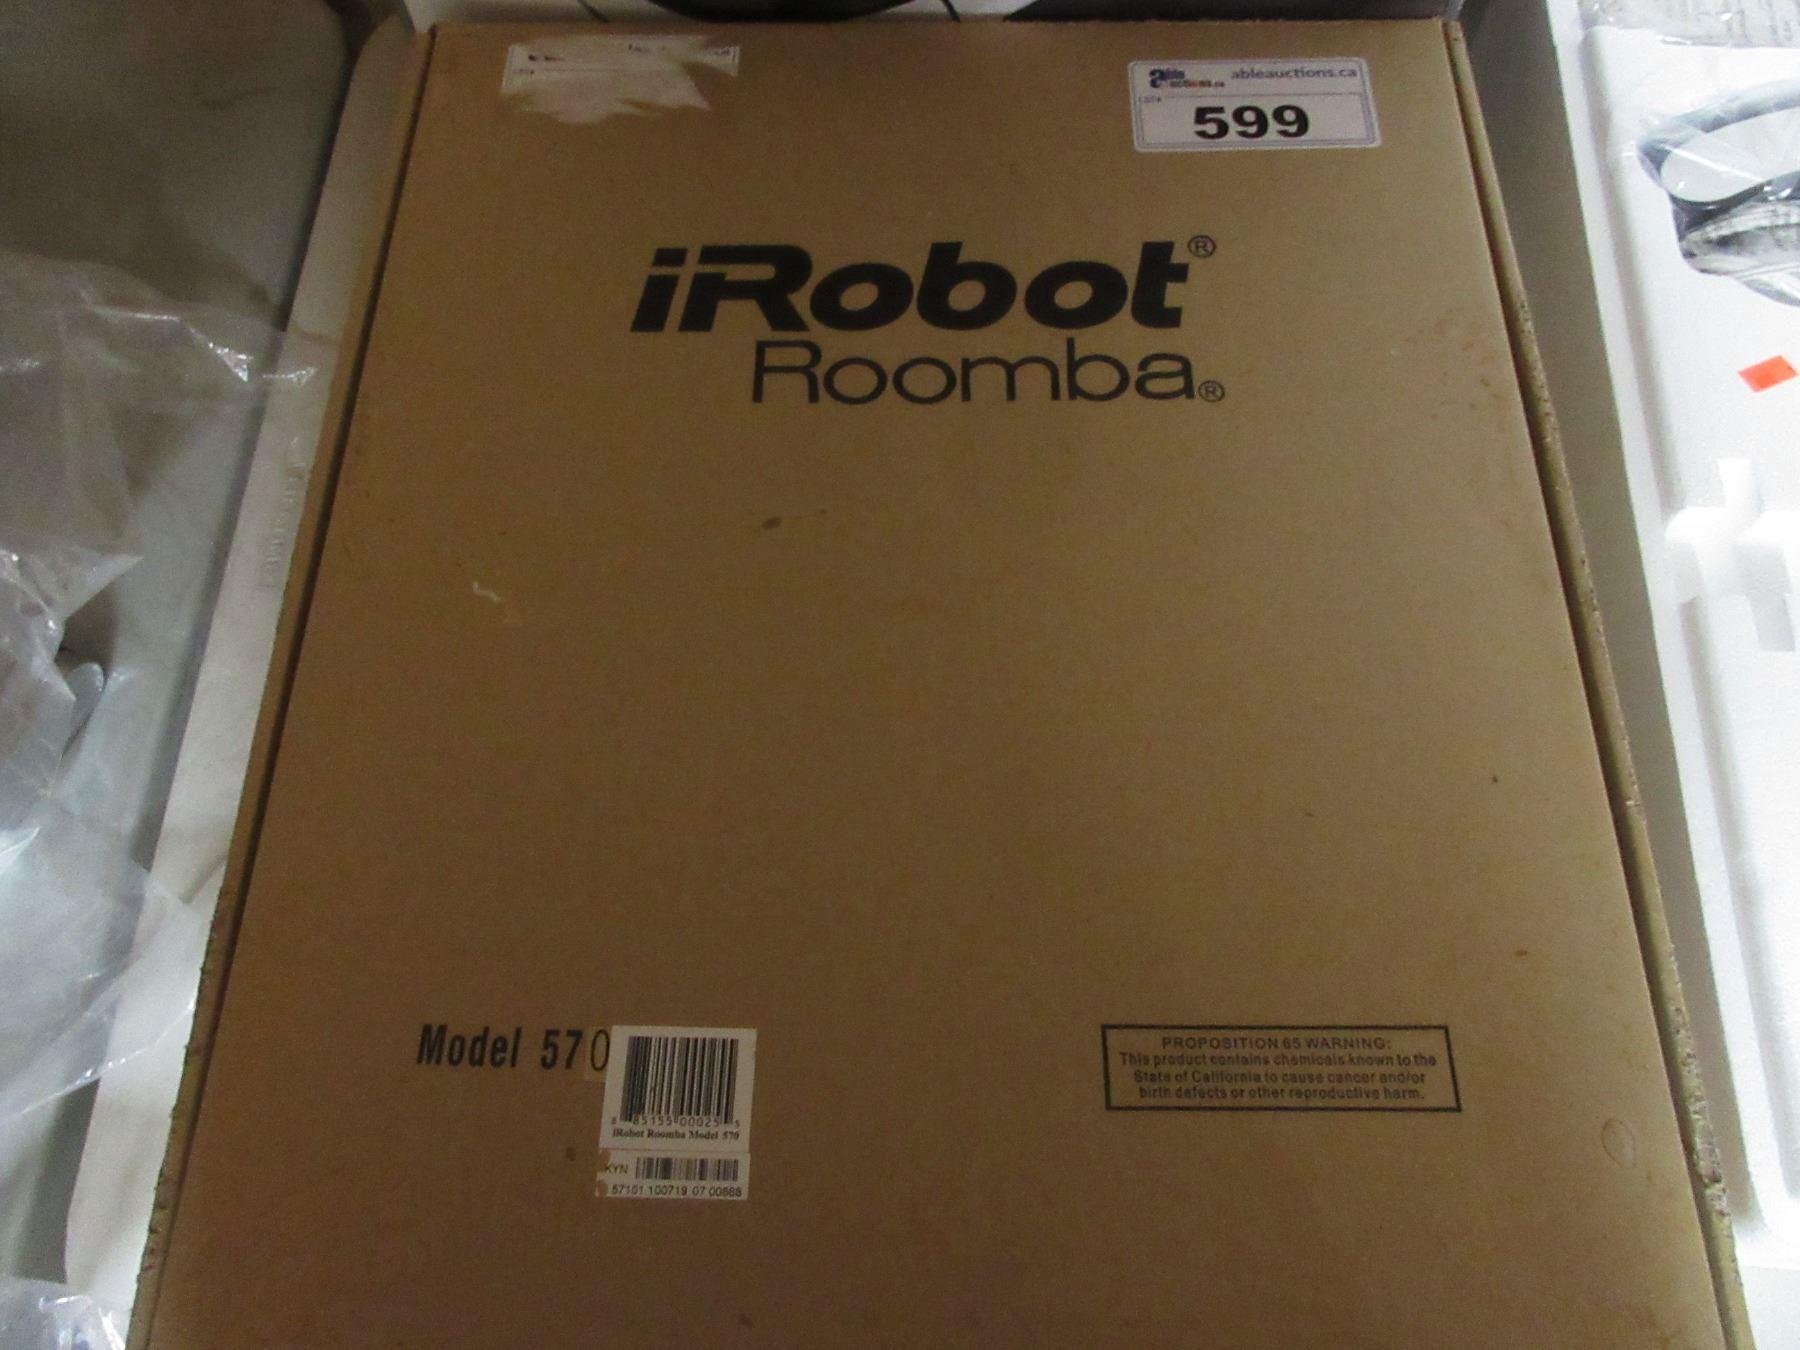 IROBOT ROOMBA VAC